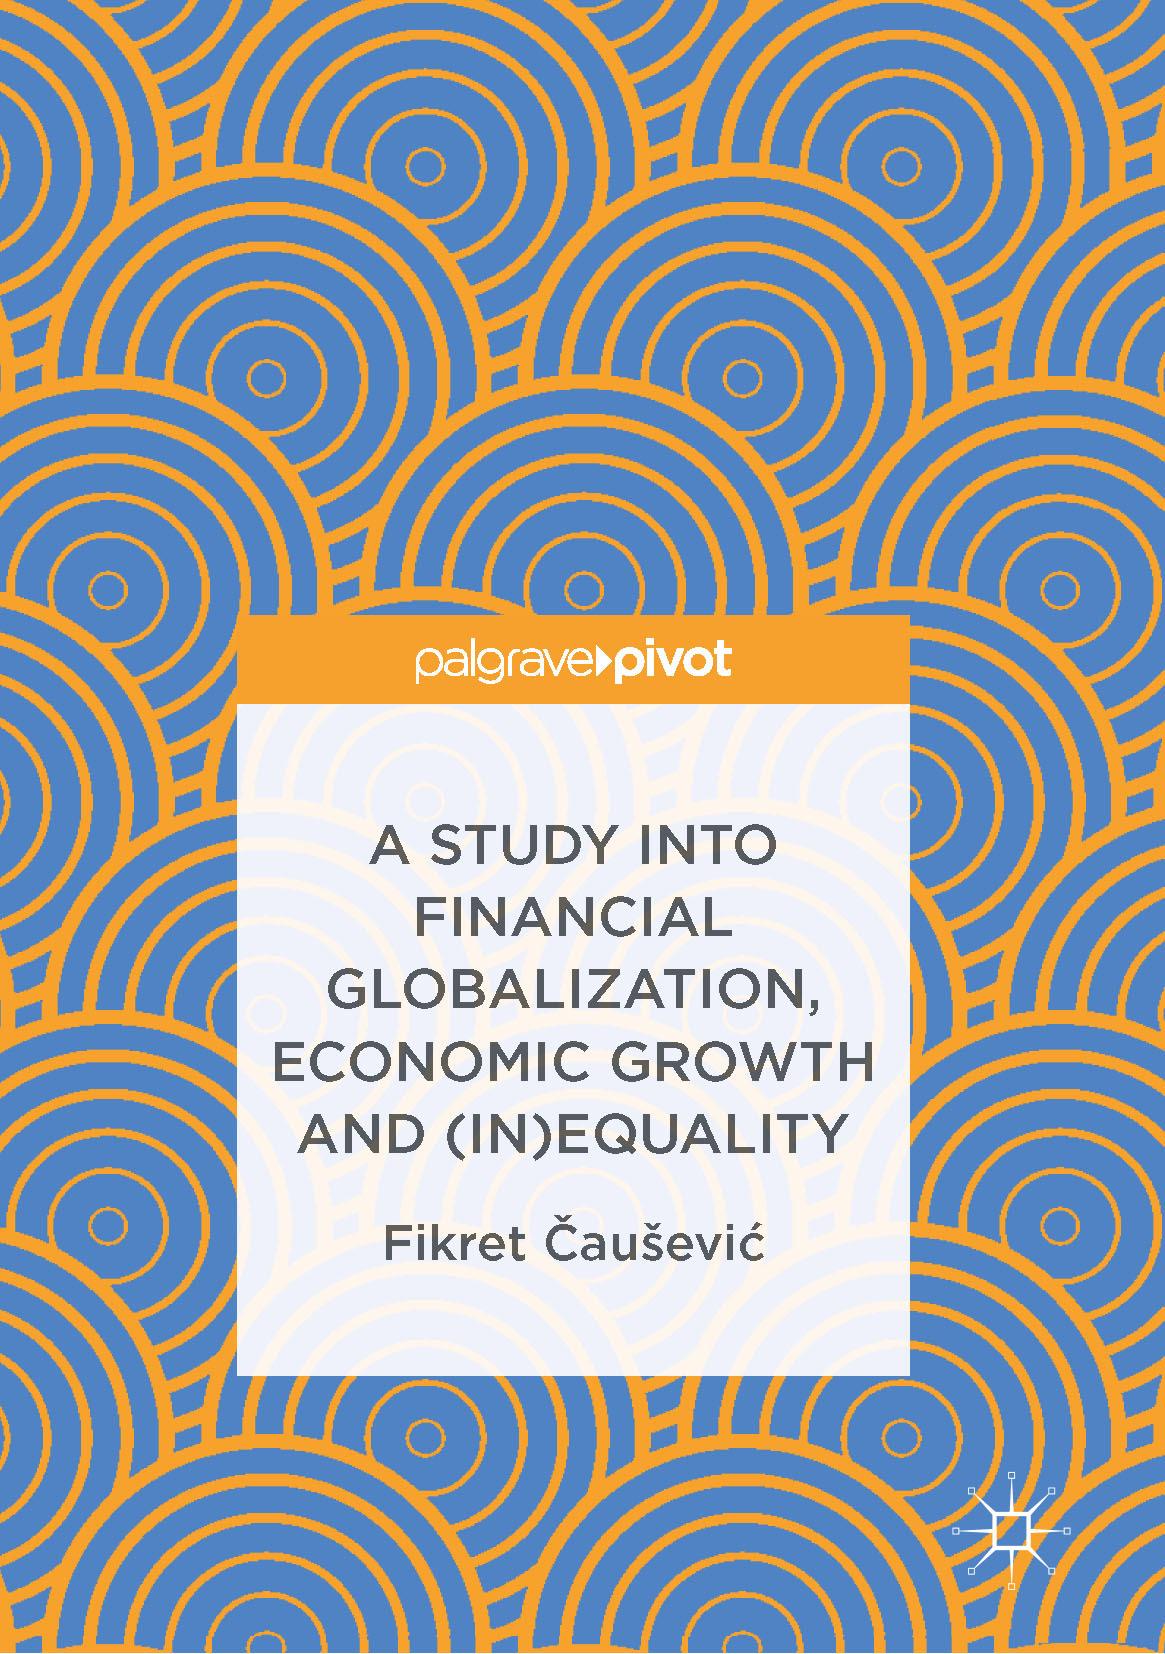 Čaušević, Fikret - A Study into Financial Globalization, Economic Growth and (In)Equality, ebook